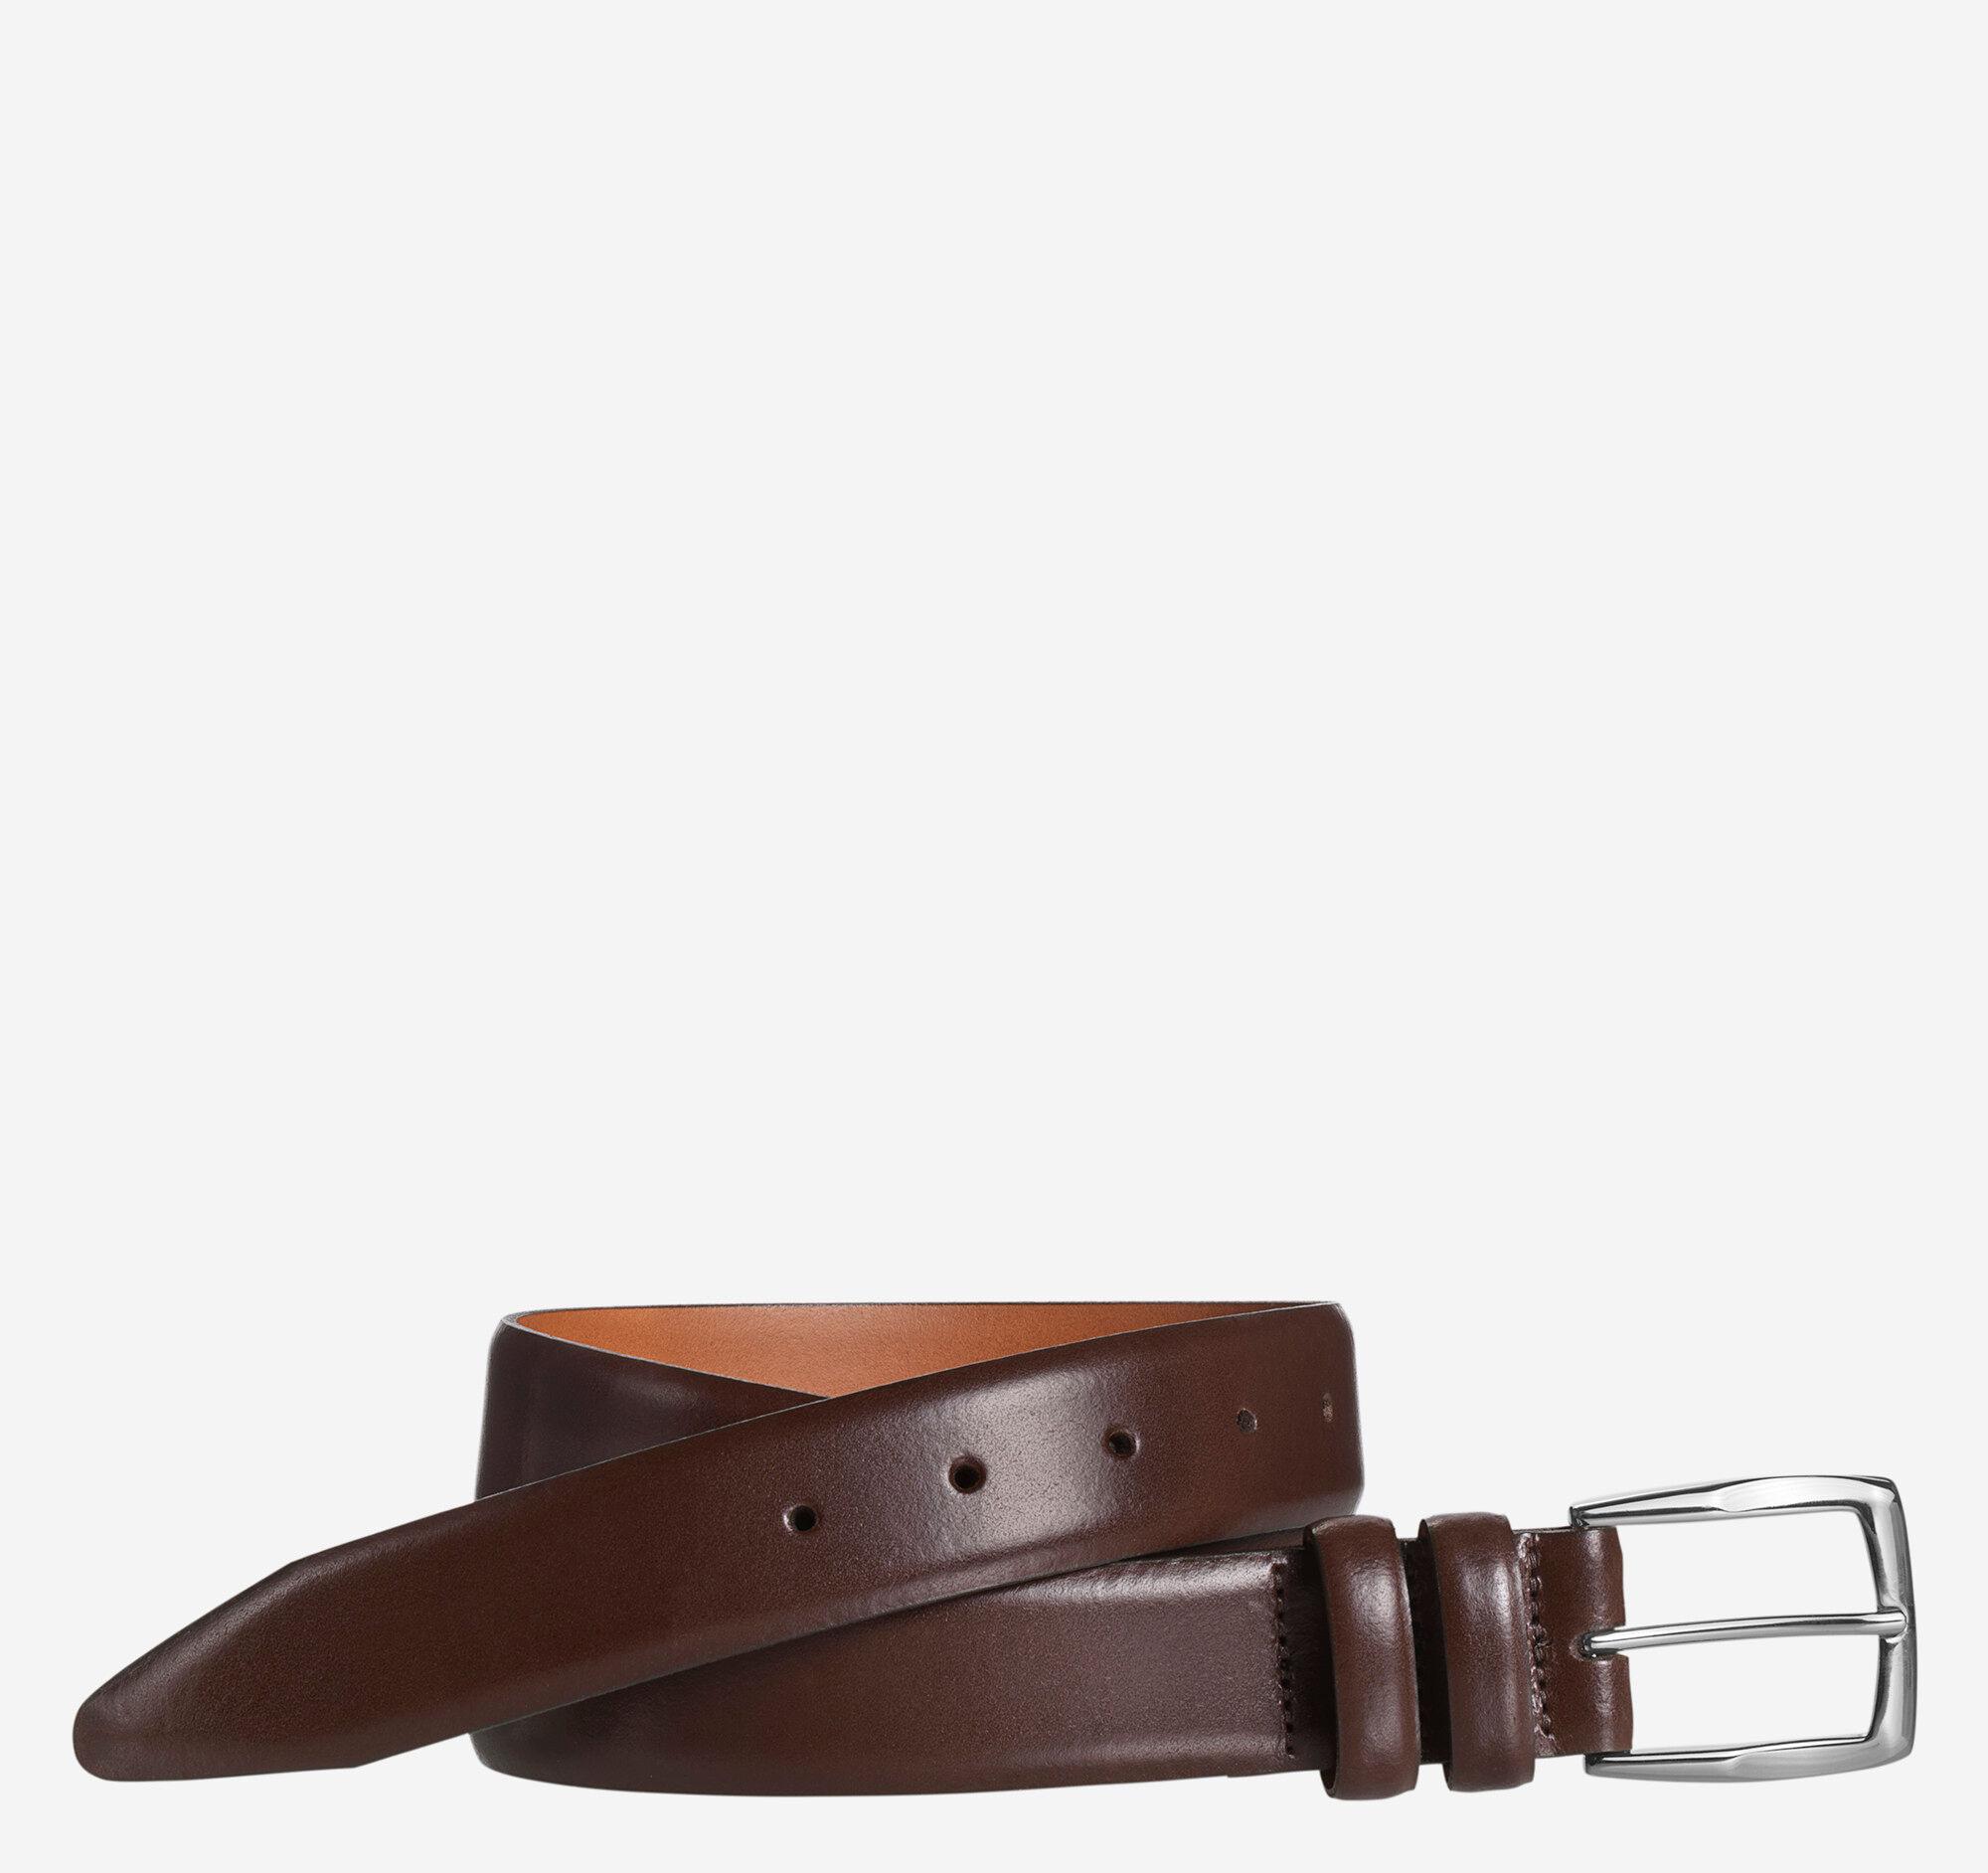 Johnston & Murphy Men's Feather Edge Belt - Brown - Size 42